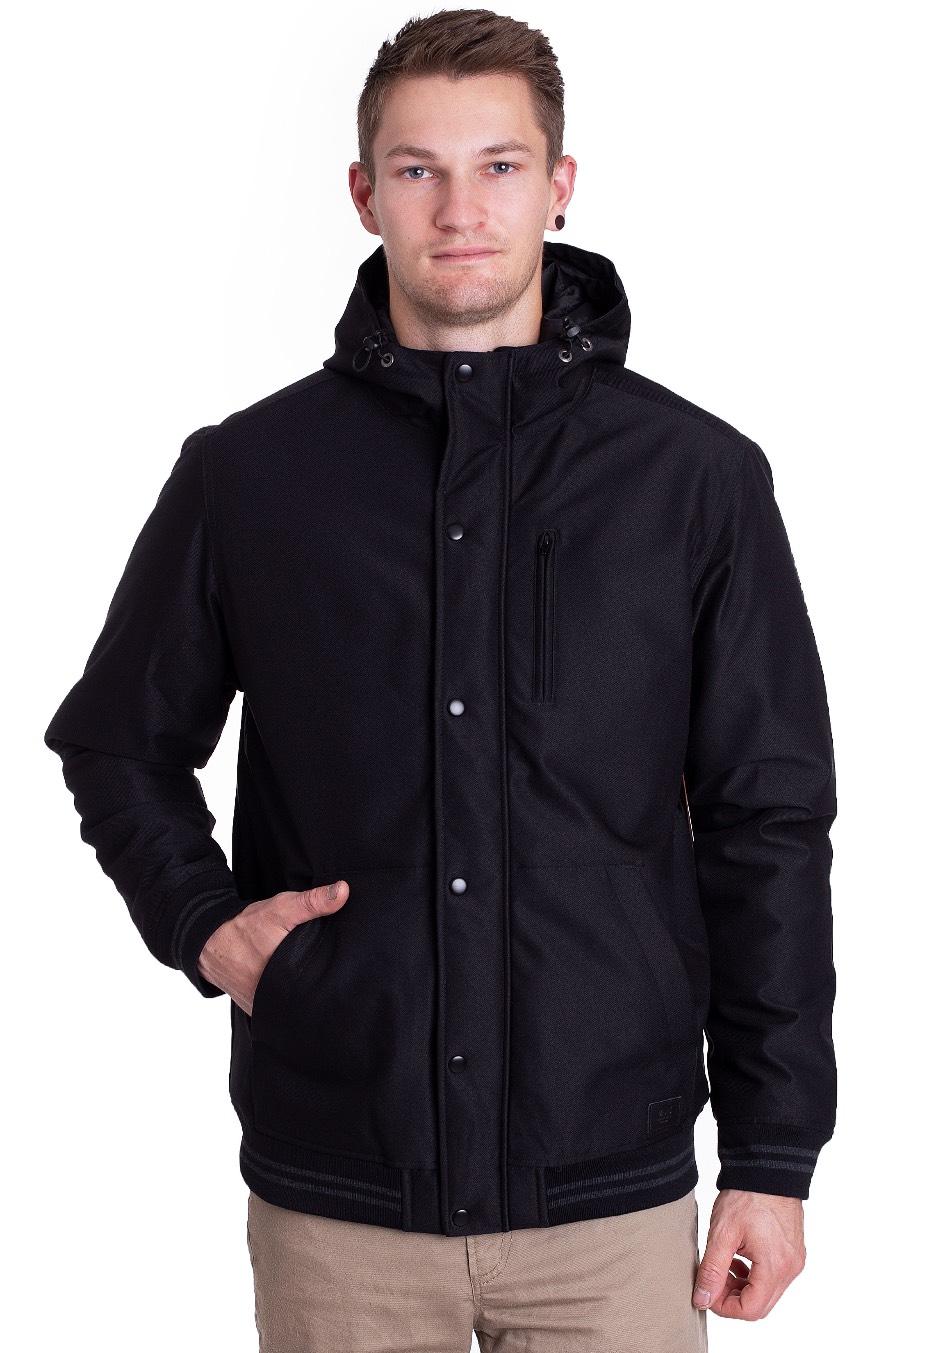 92207751d4 Vans - Fieldbrook MTE Black Black - Jacket - Impericon.com Worldwide